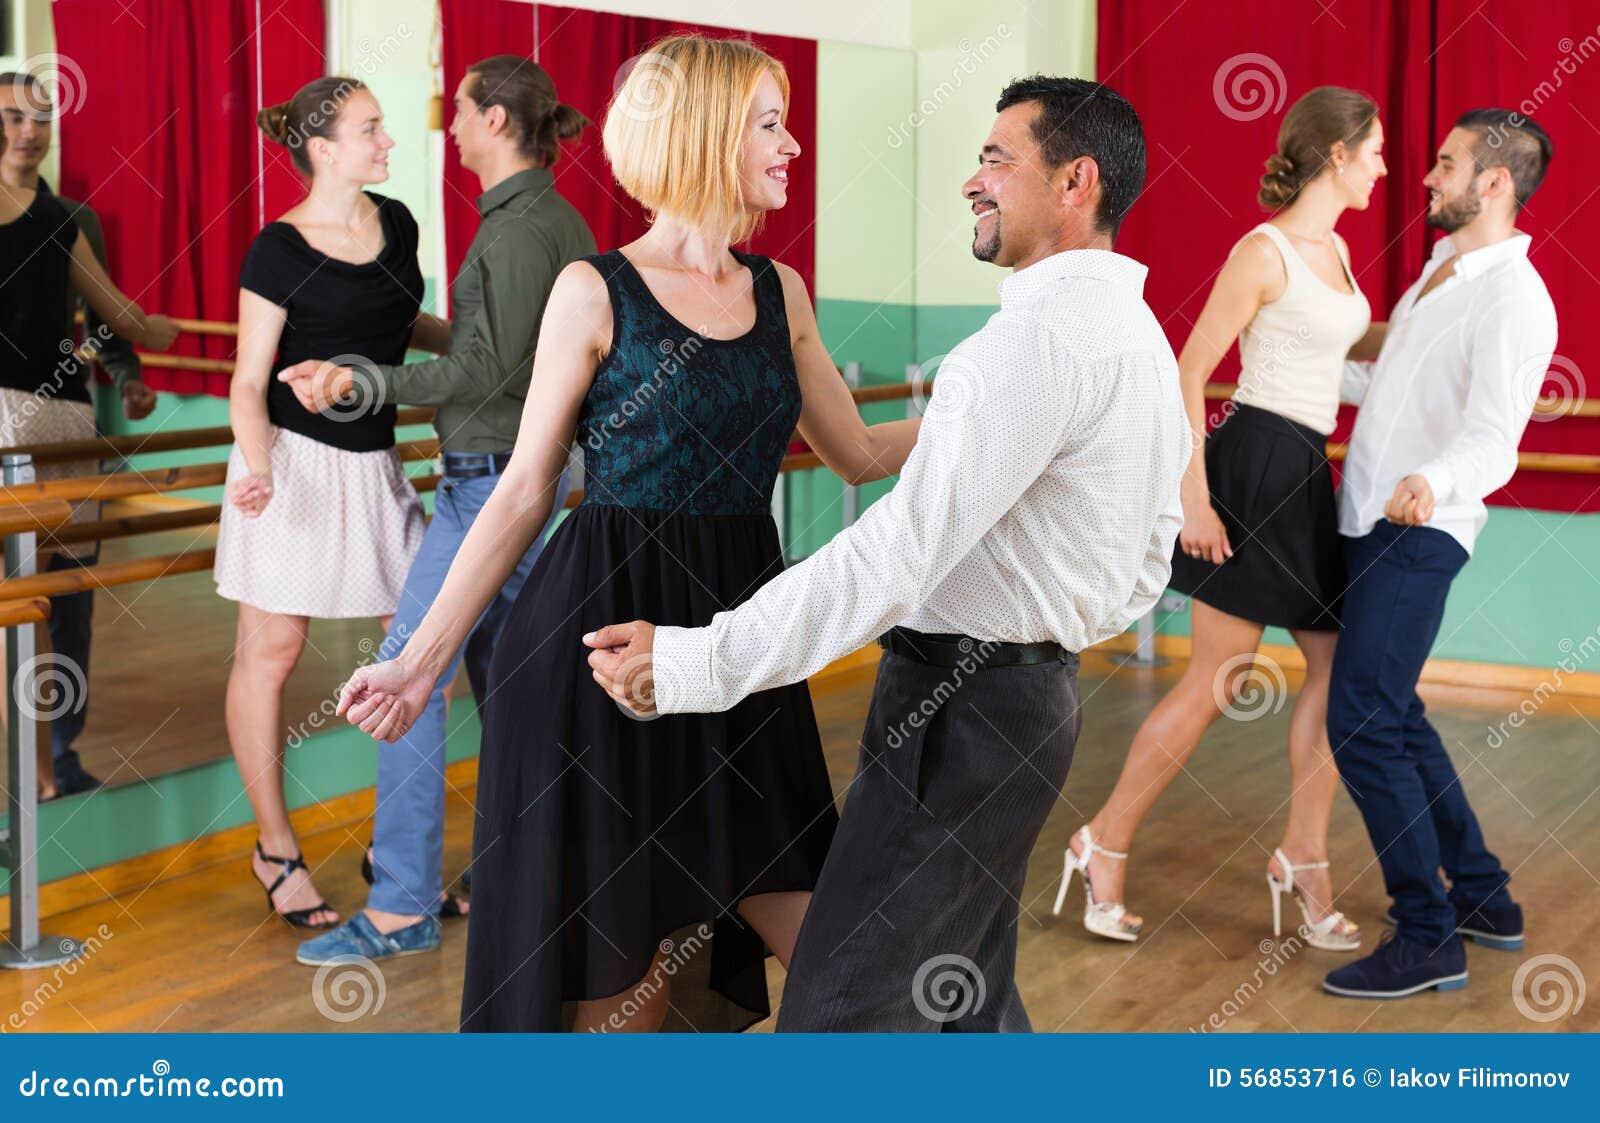 Young adults having dance class